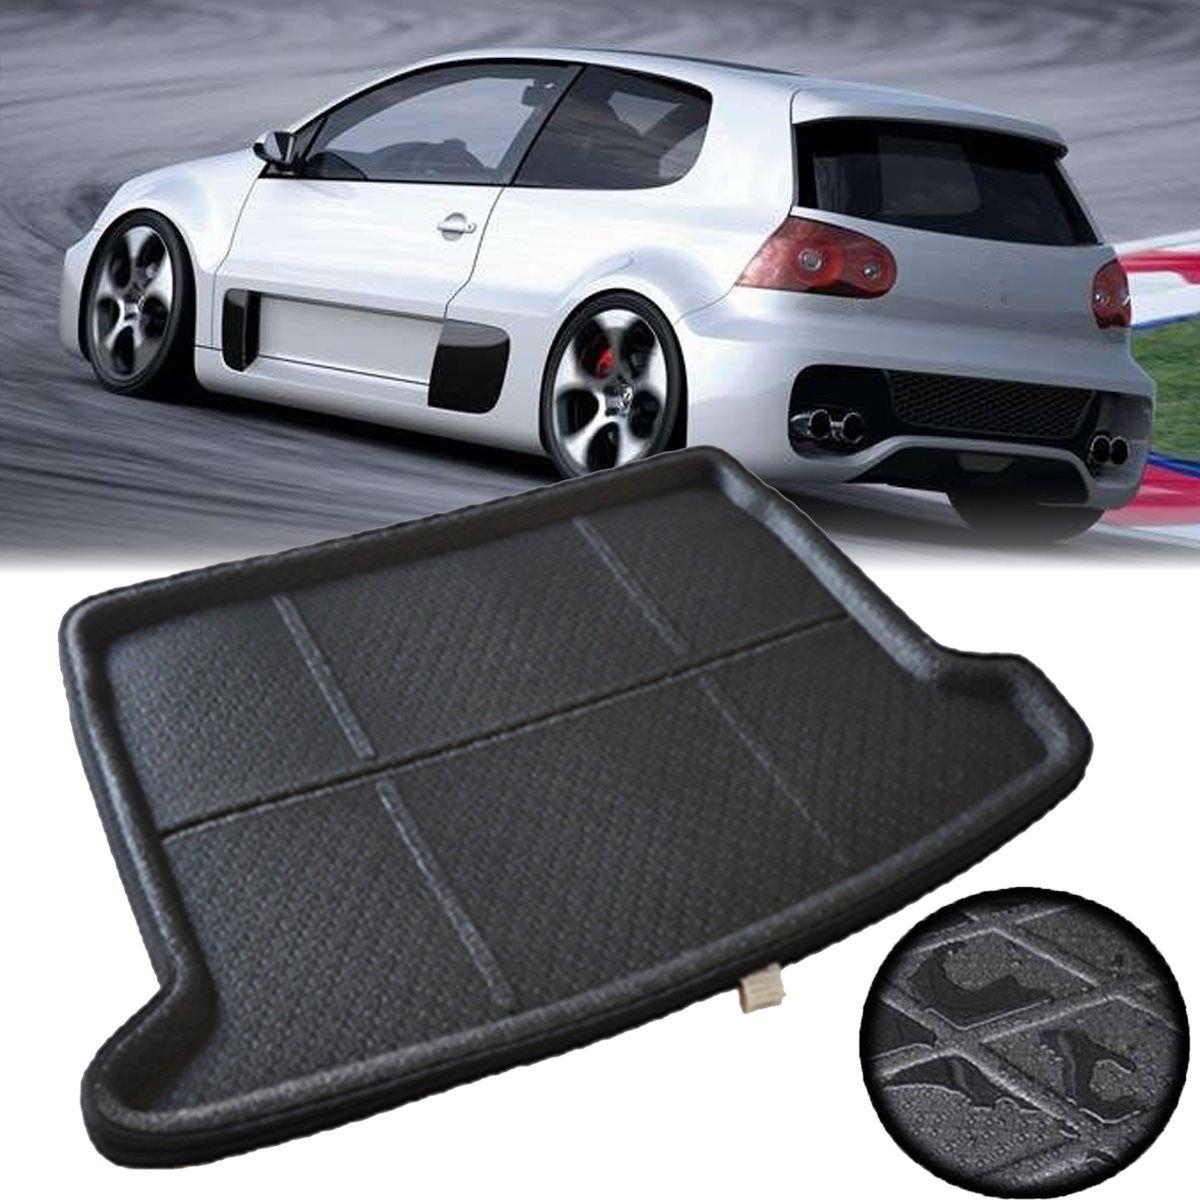 EVA Car Trunk Tray Boot Cushion Mat Rear Trunk Liner Cargo For VW Golf 6 GTI 2009-2013